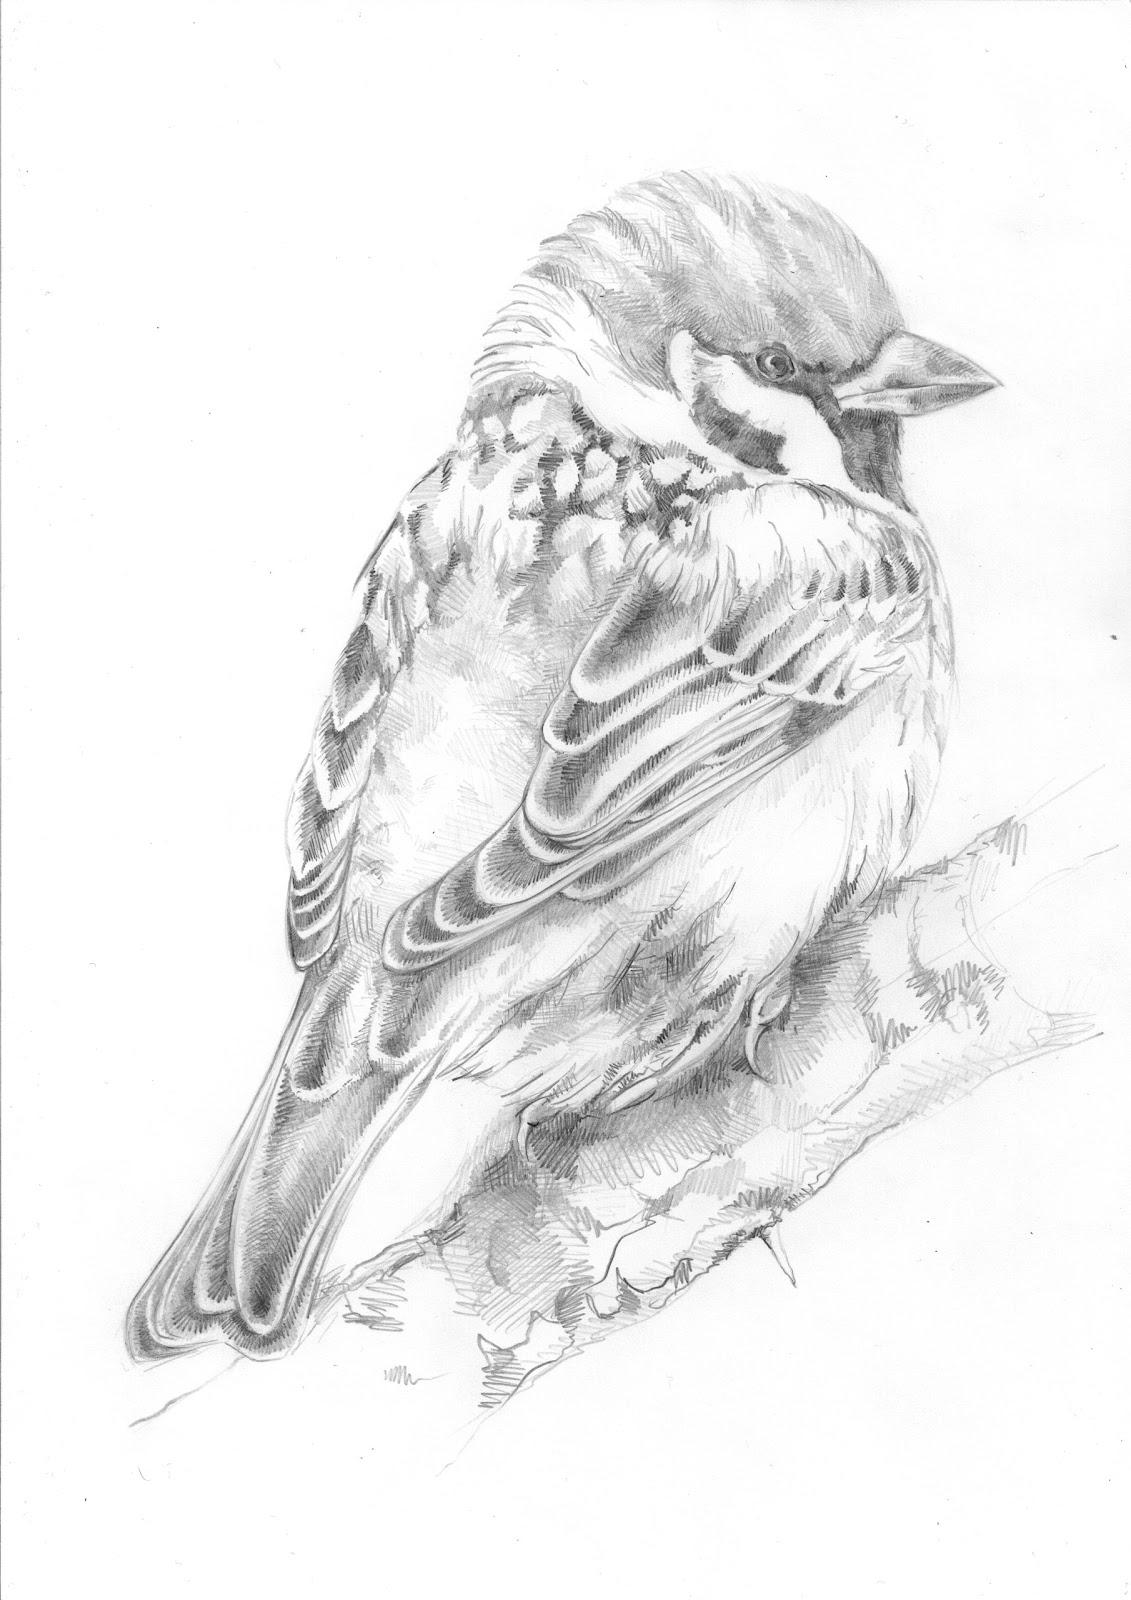 Samuel Birding: Tree Sparrow